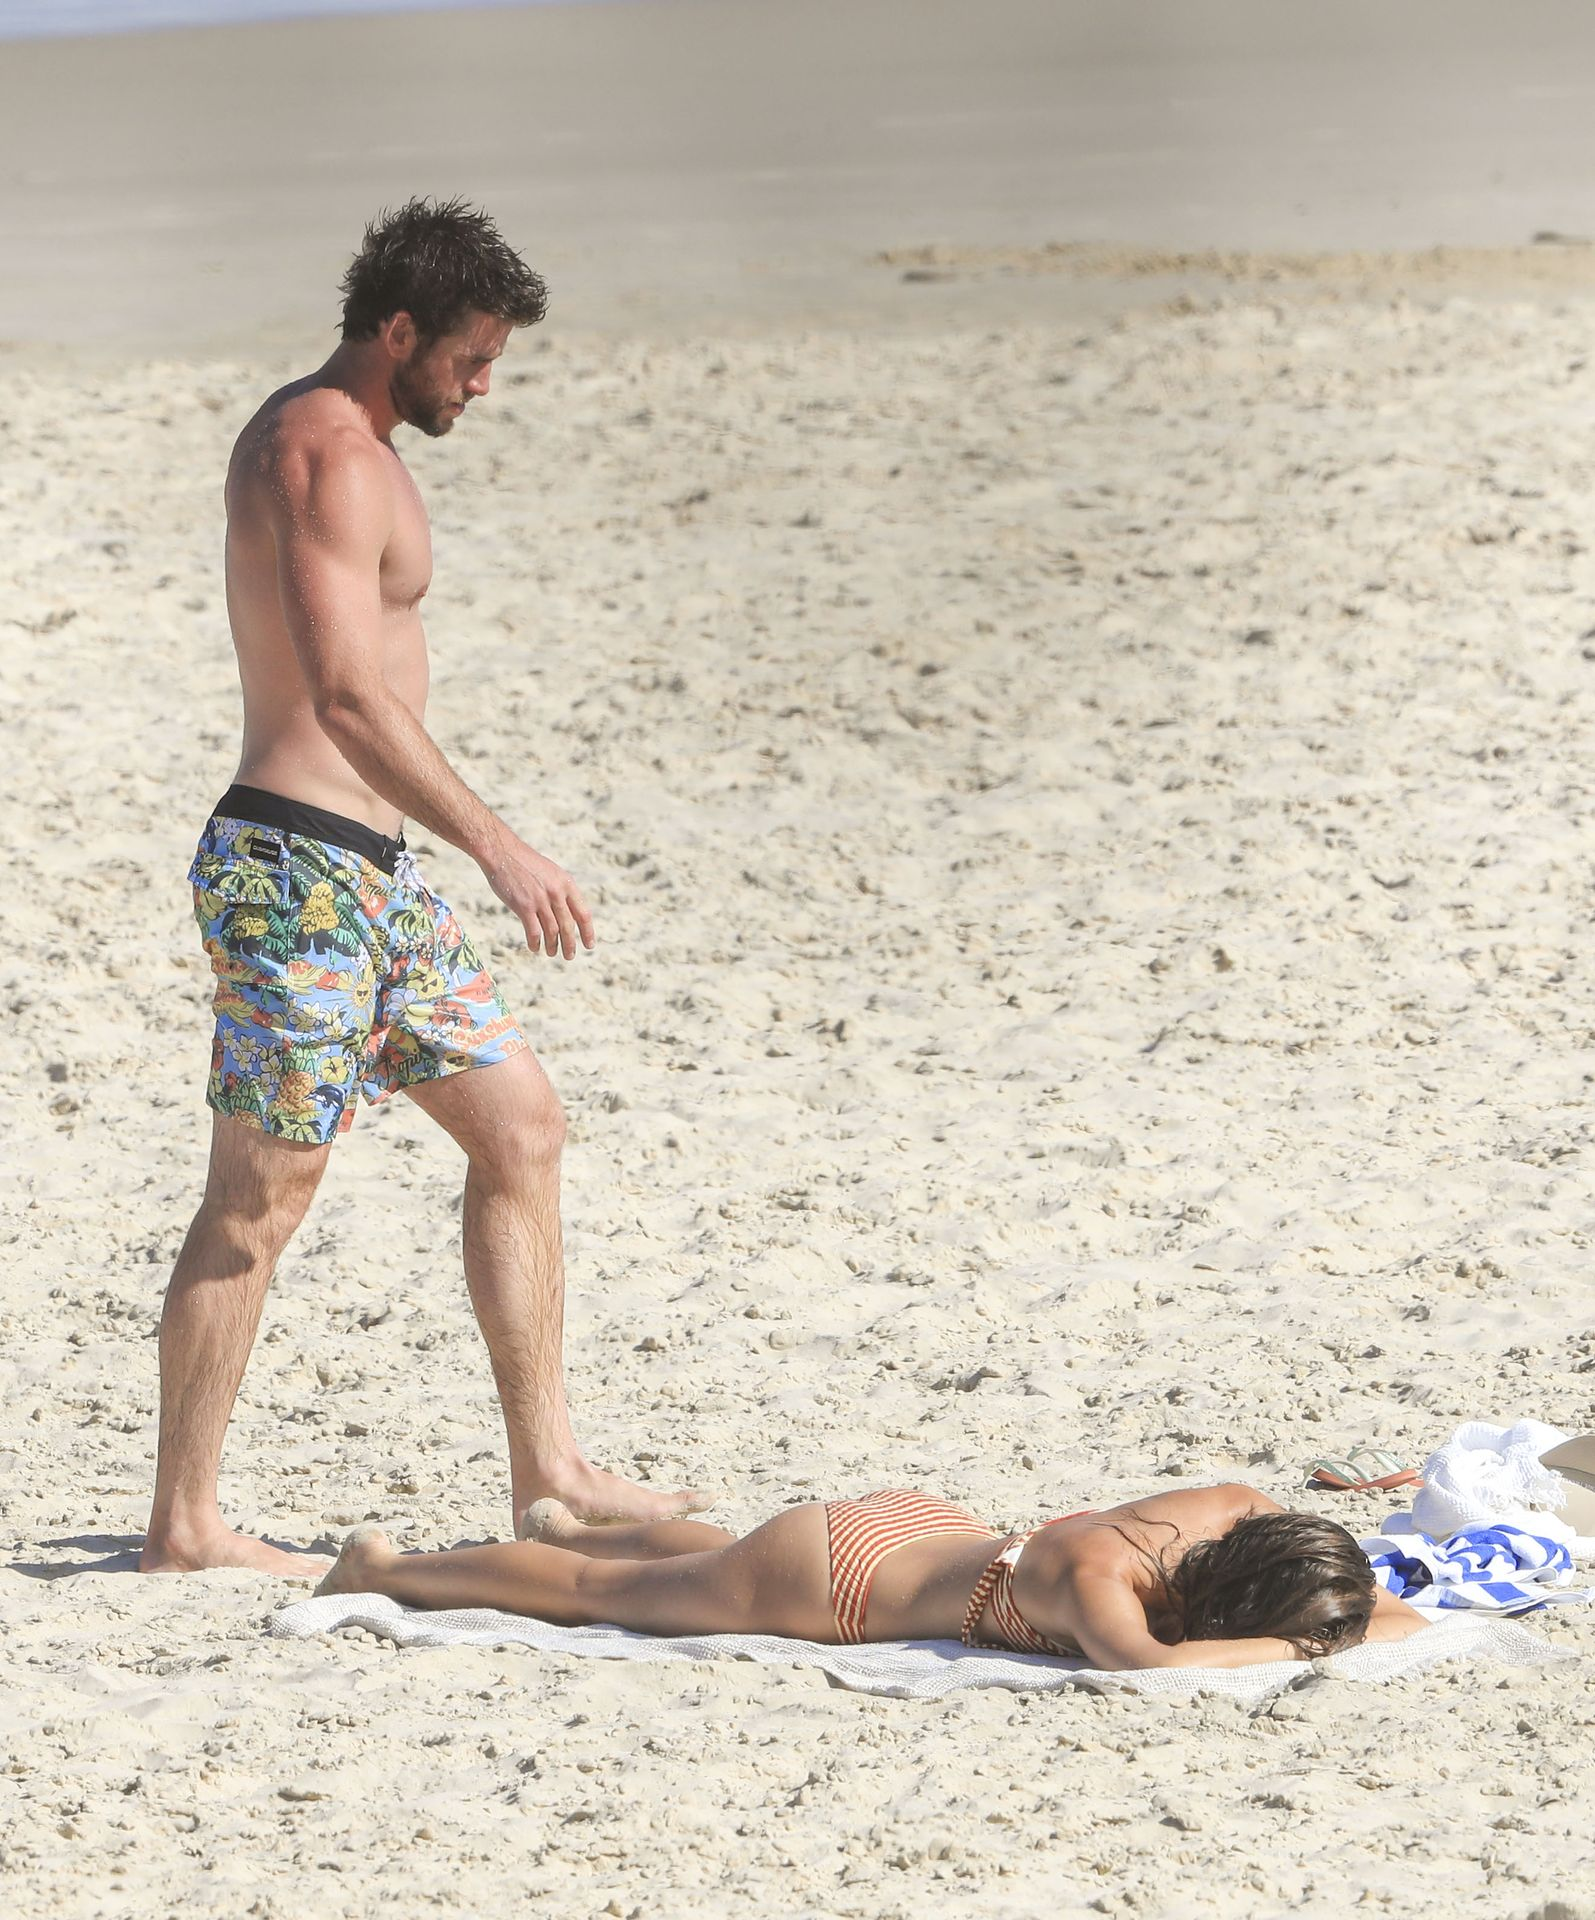 Gabriella Brooks Hot – Liam Hemsworth's New Girlfriend 0031